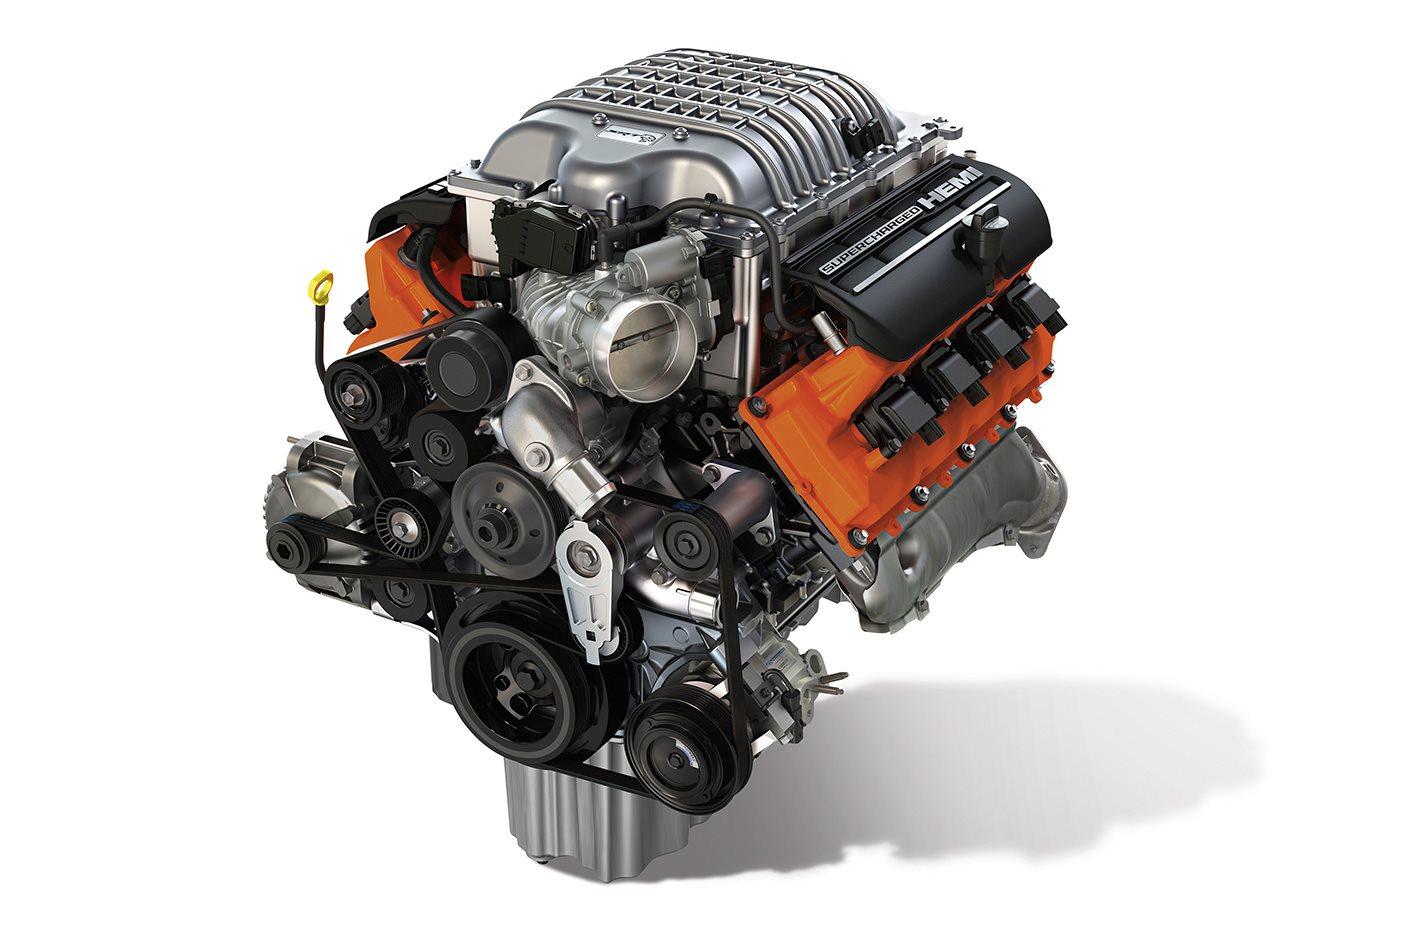 Mopar-Hemi-crate-motor